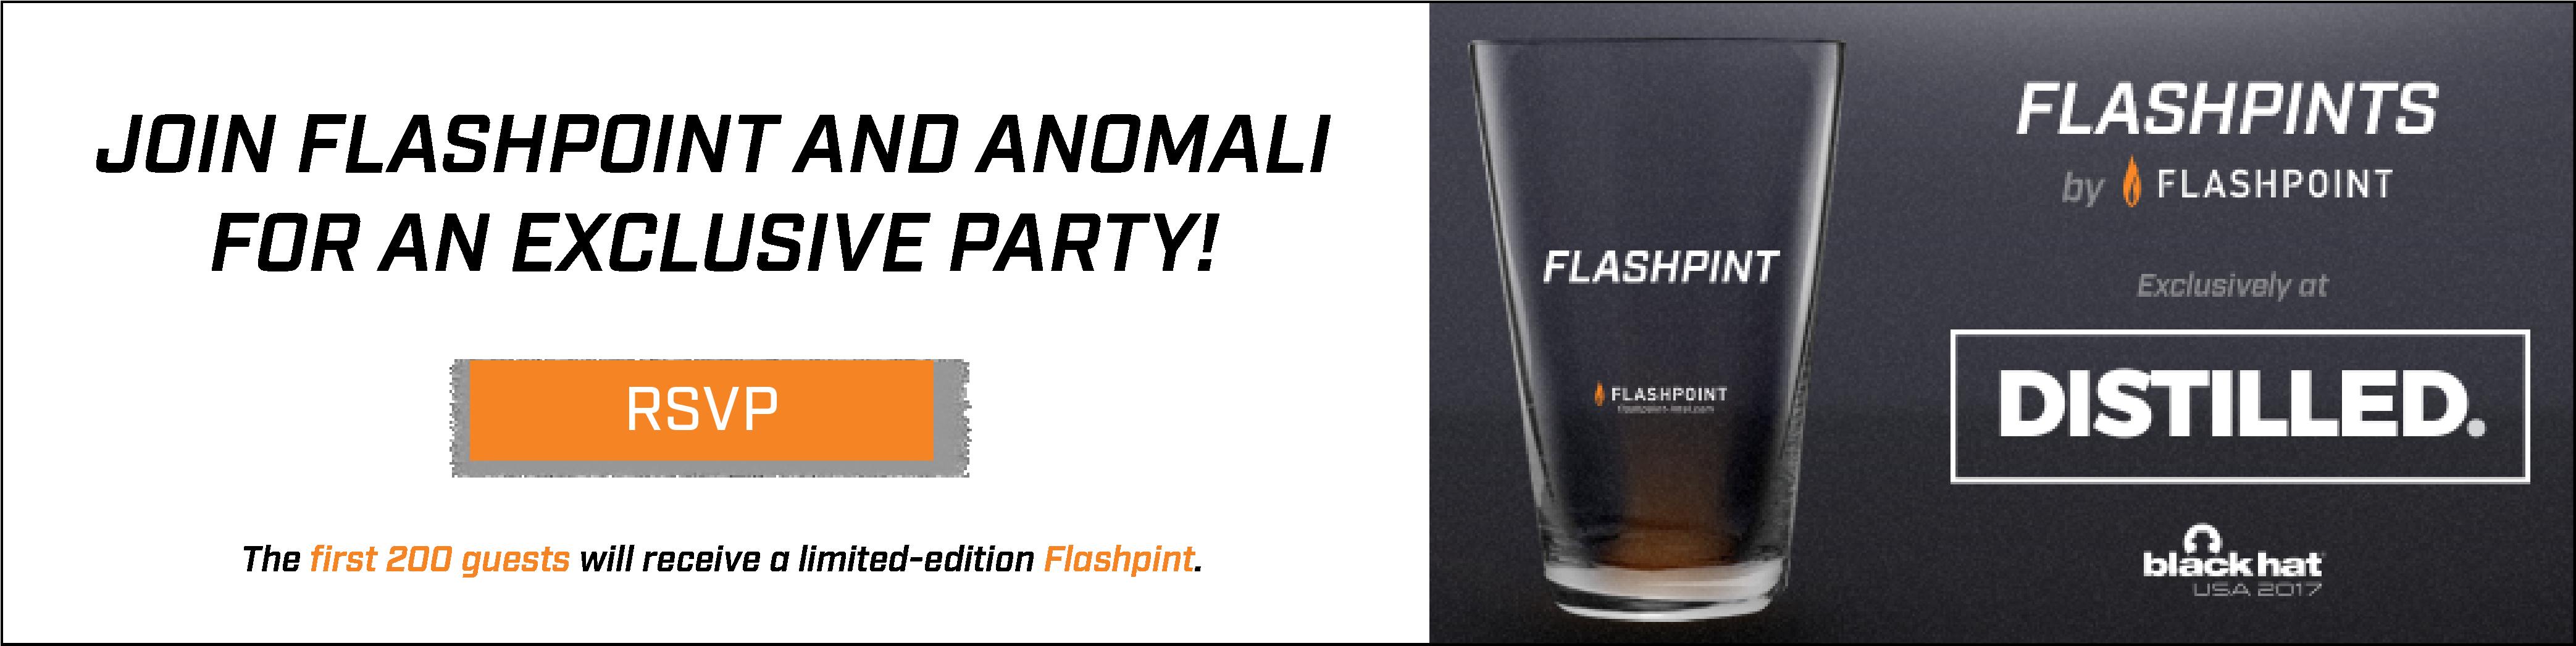 Flashpoint-Anomali-BlackHatUSA2017-DistilledParty